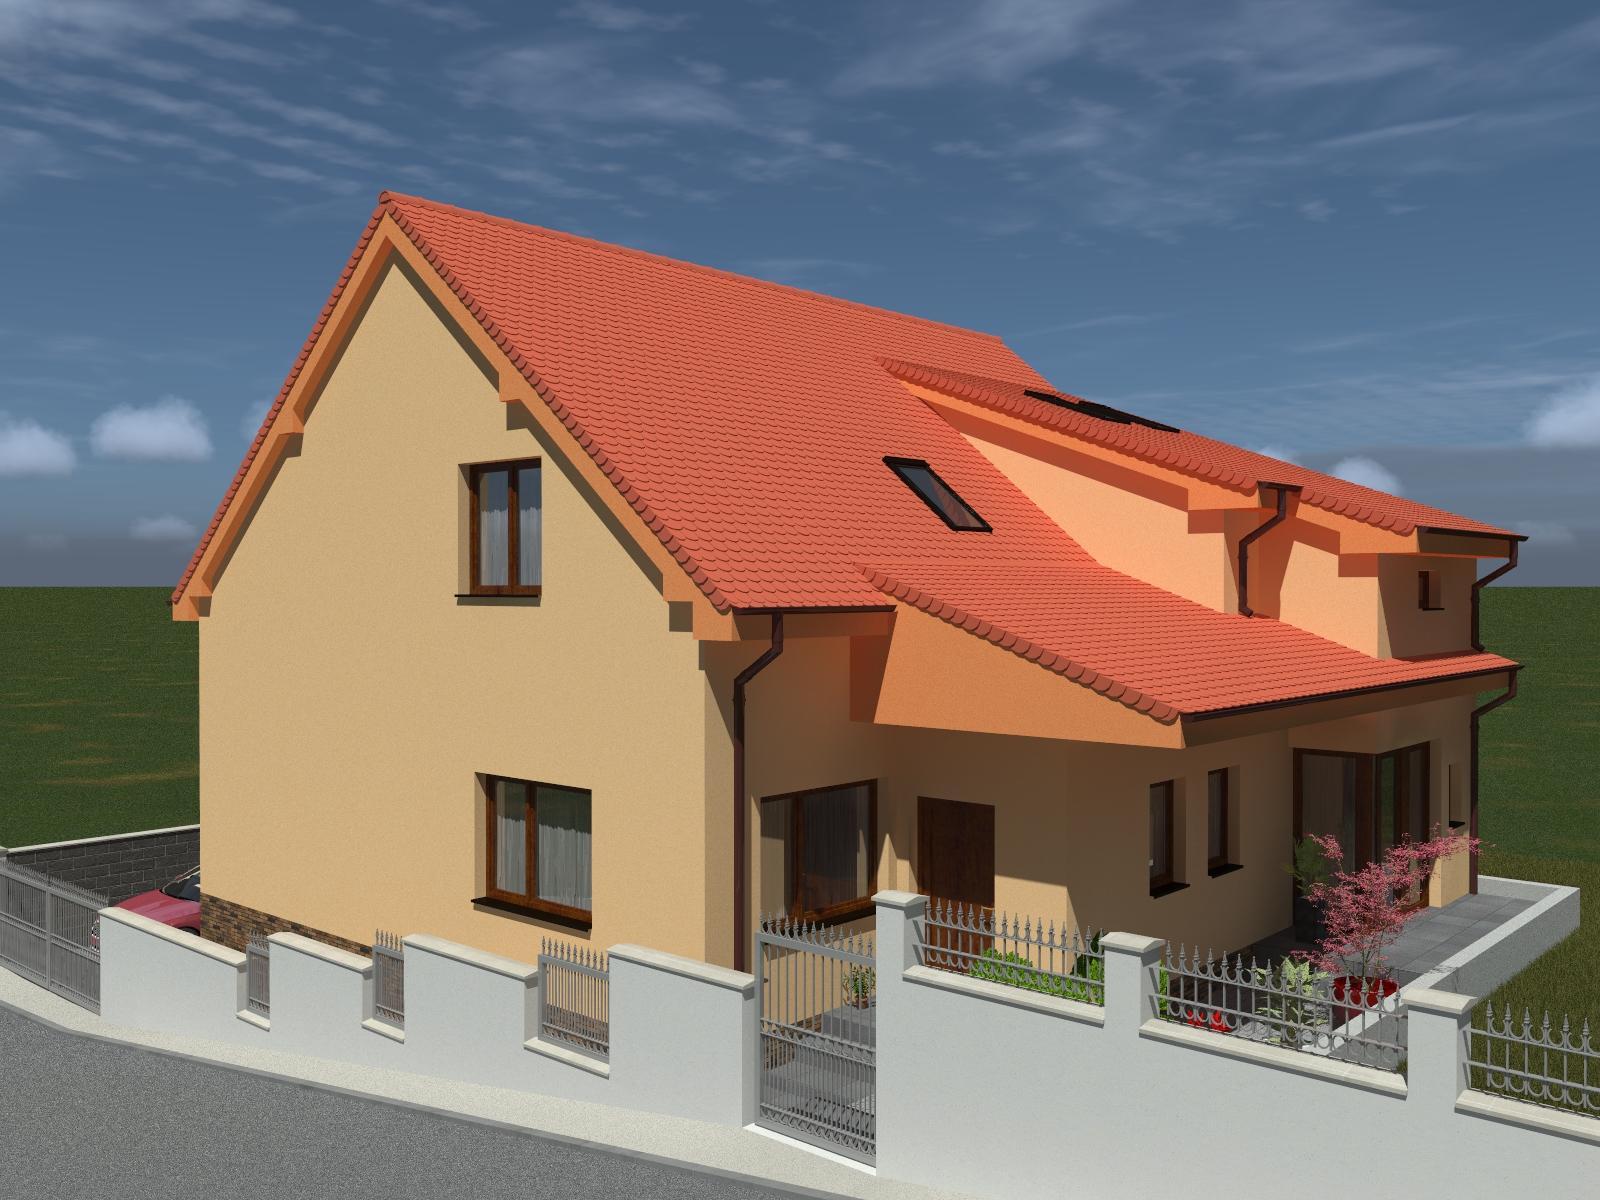 Prestavba podkrovia zo sedlovo valbovej na sedlovú strechu. - Obrázok č. 10